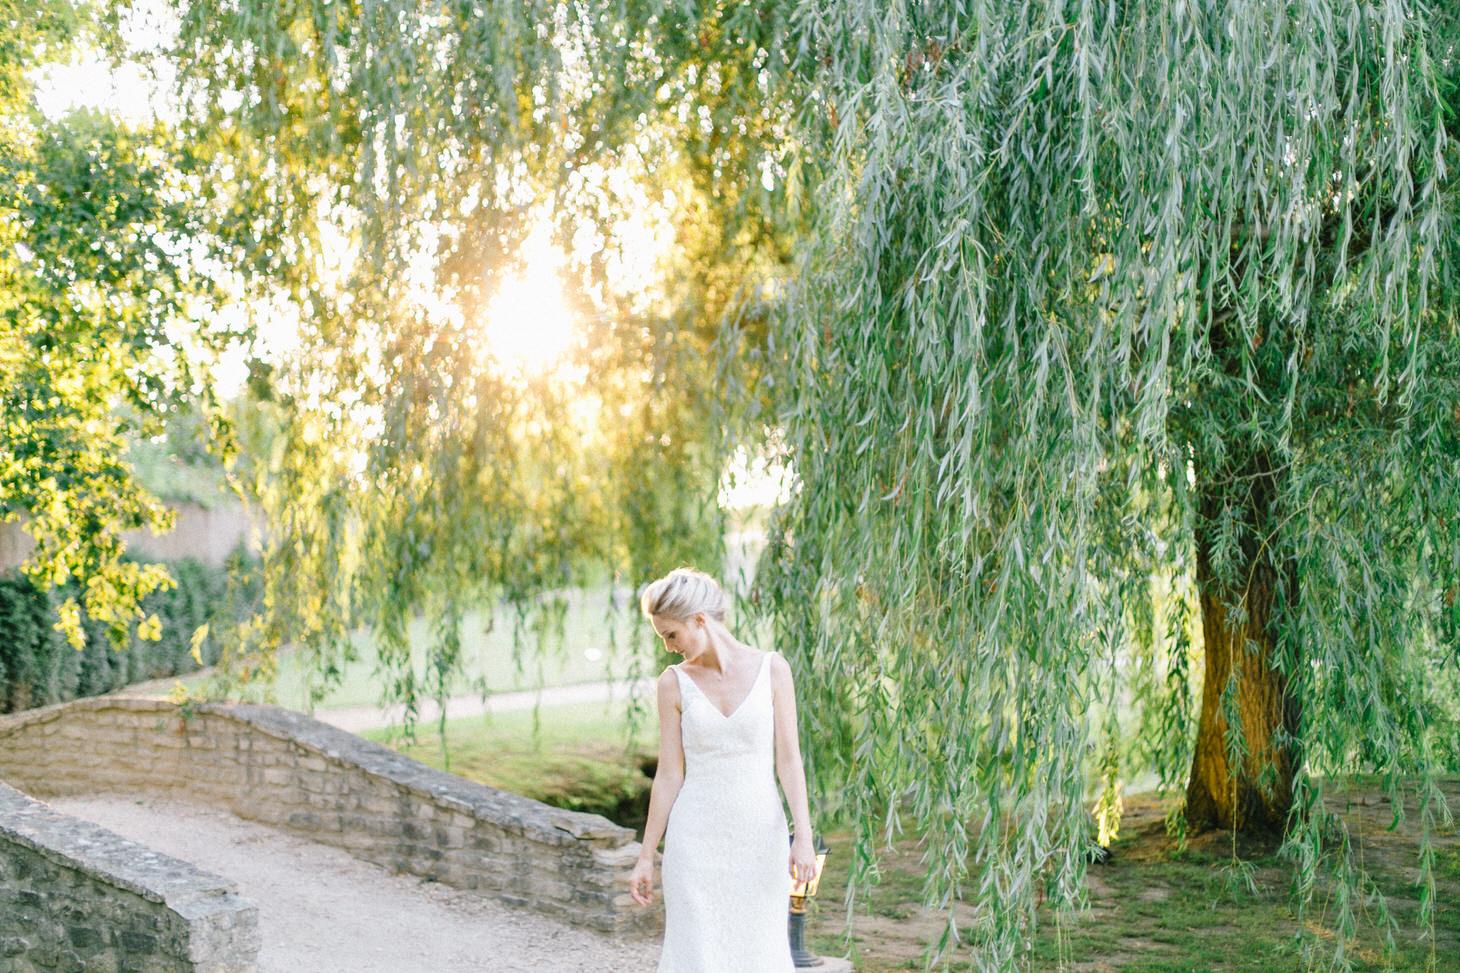 photographe-mariage-paris-montfort-l-amaury-084